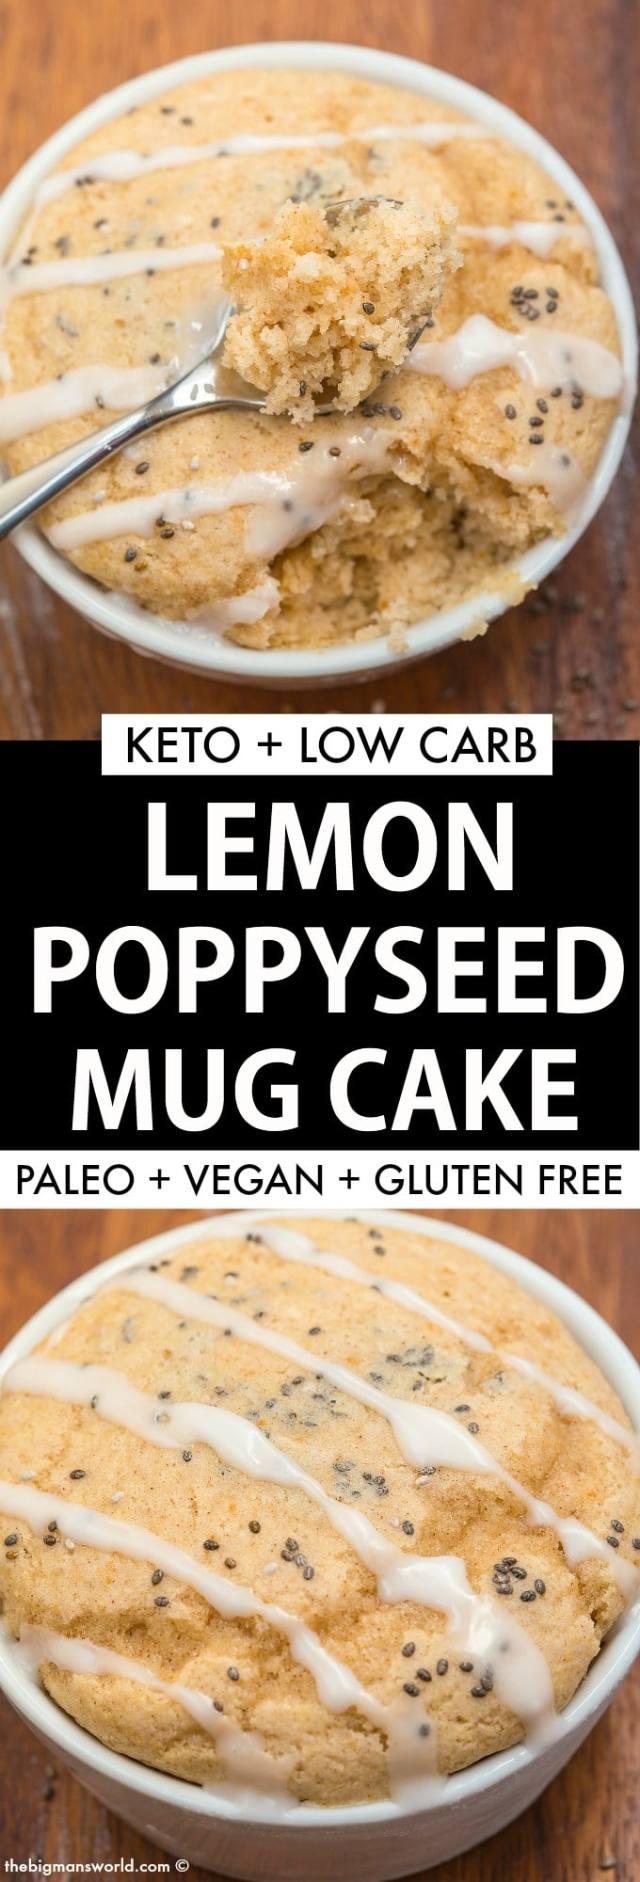 Keto Lemon Poppy Seed Mug Cake Muffin